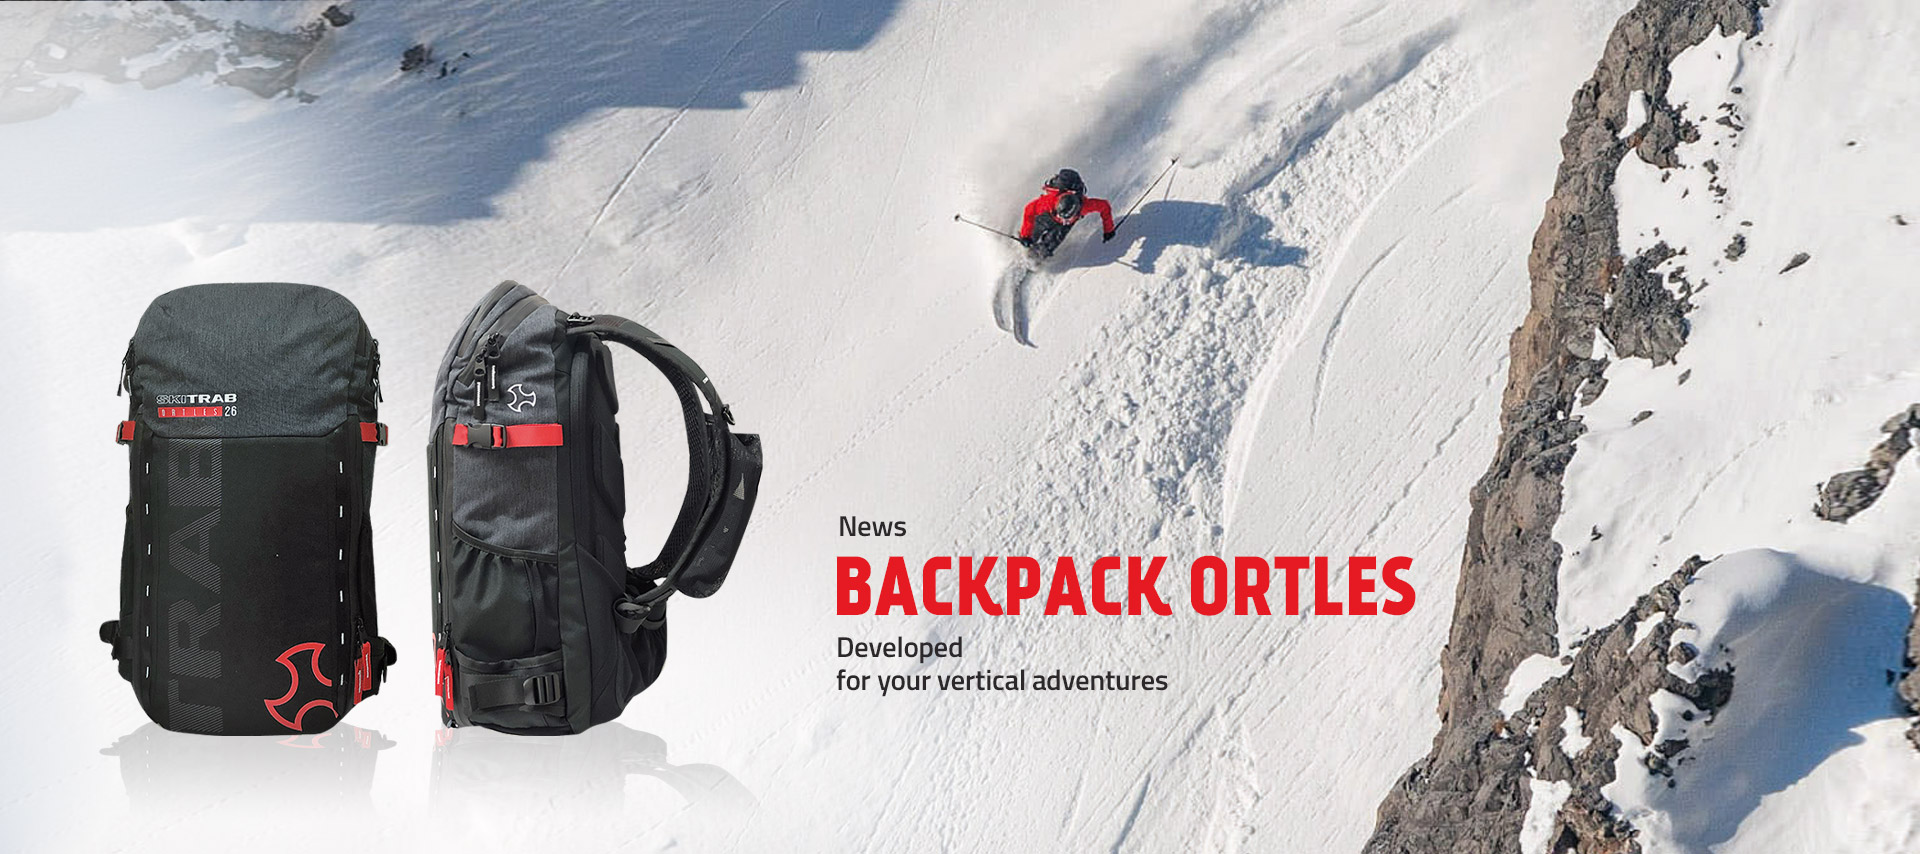 COM_Home21_Ortles_Backpack